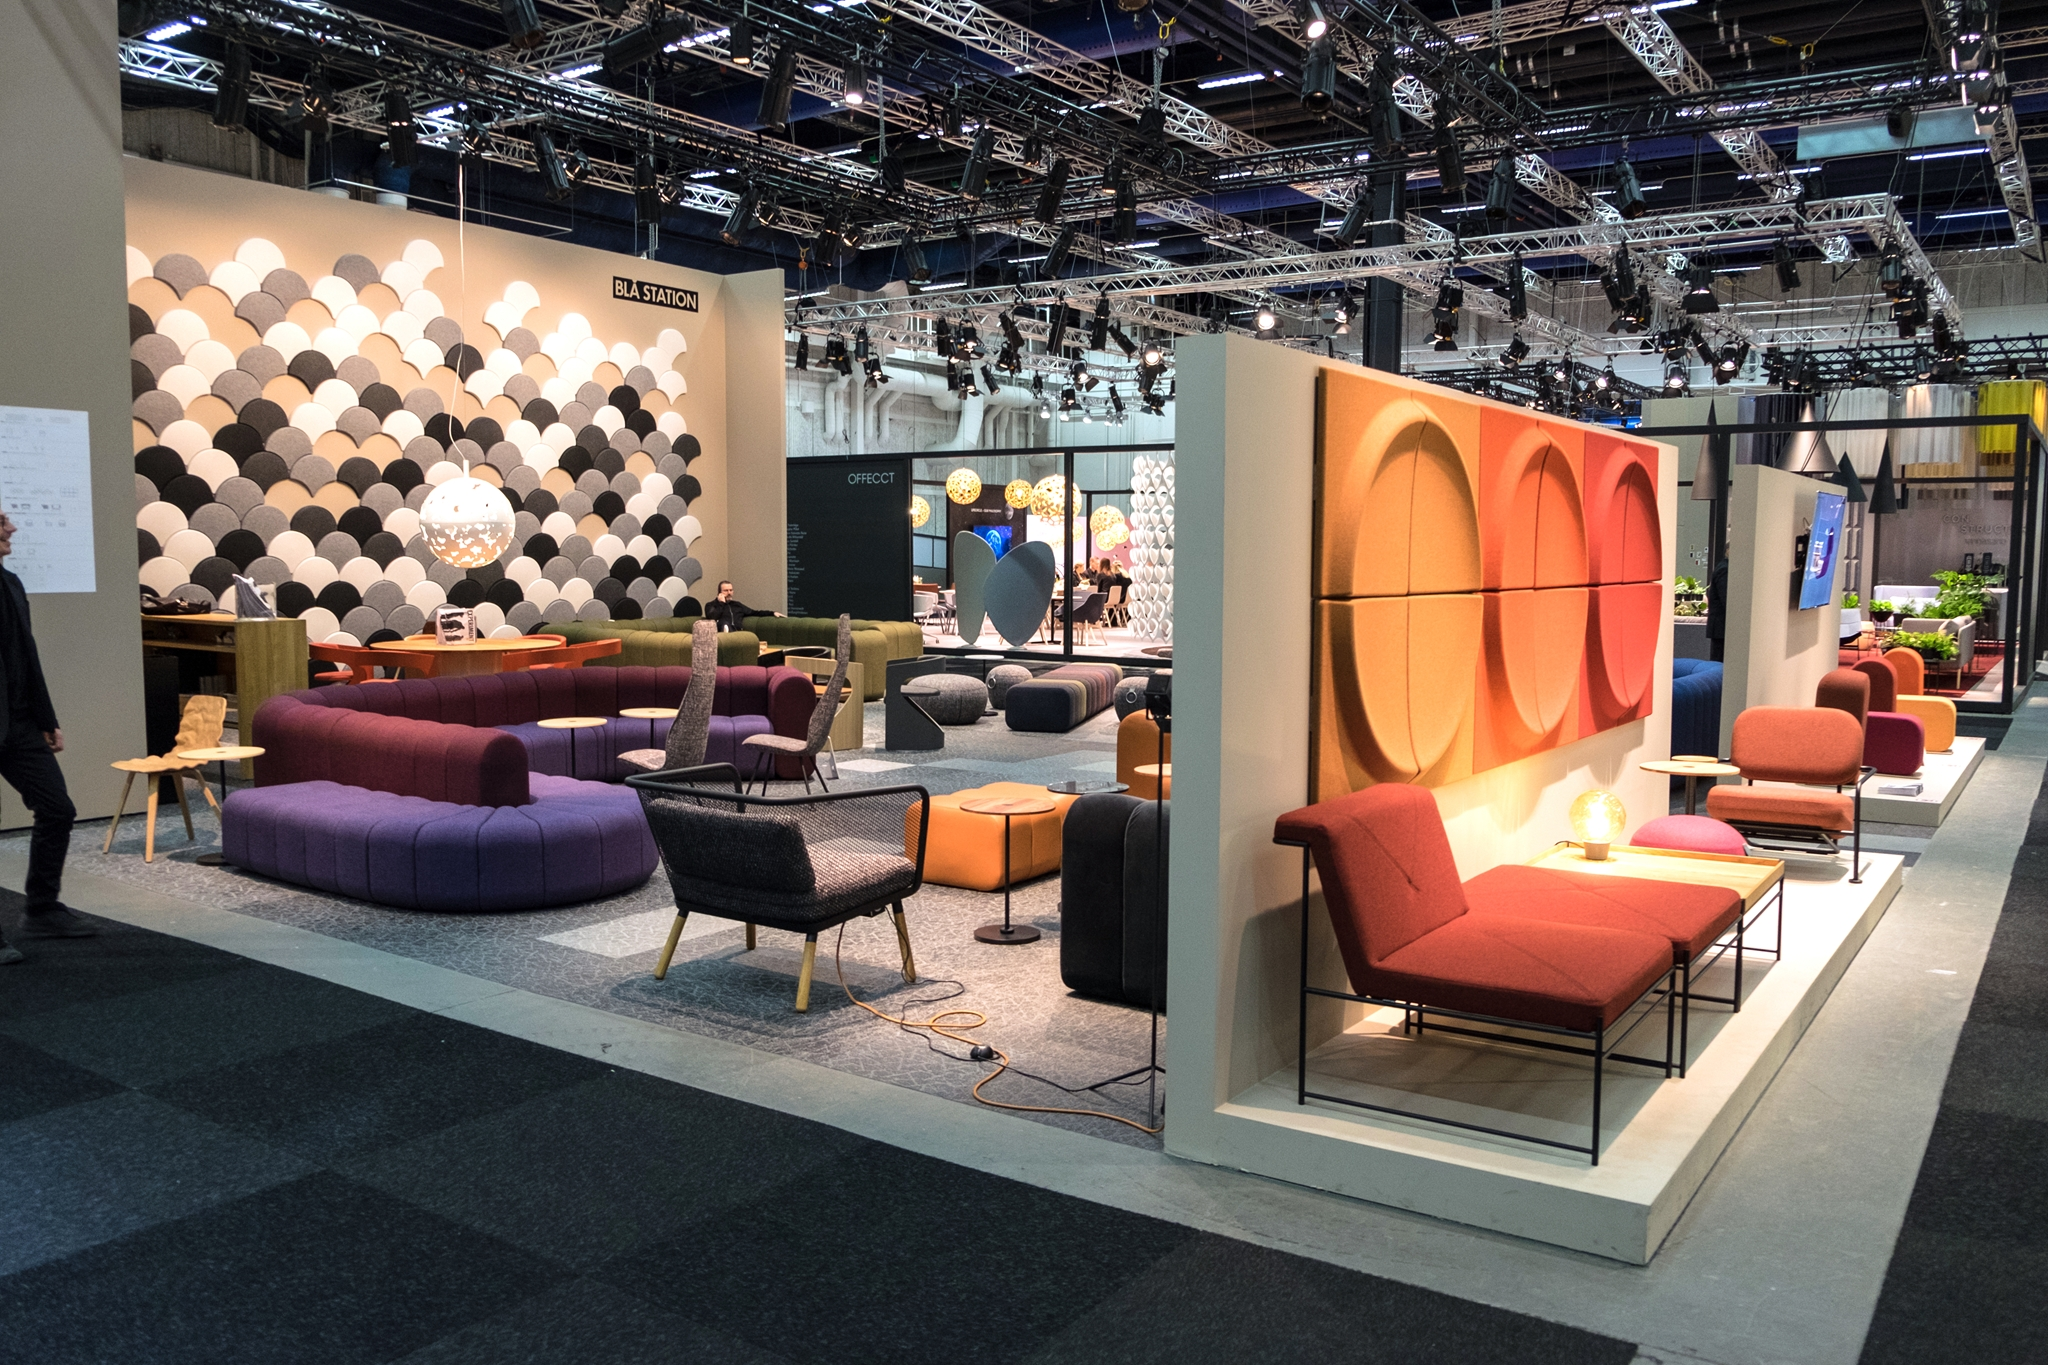 Etonnant Stockholm Furniture Fair 2017